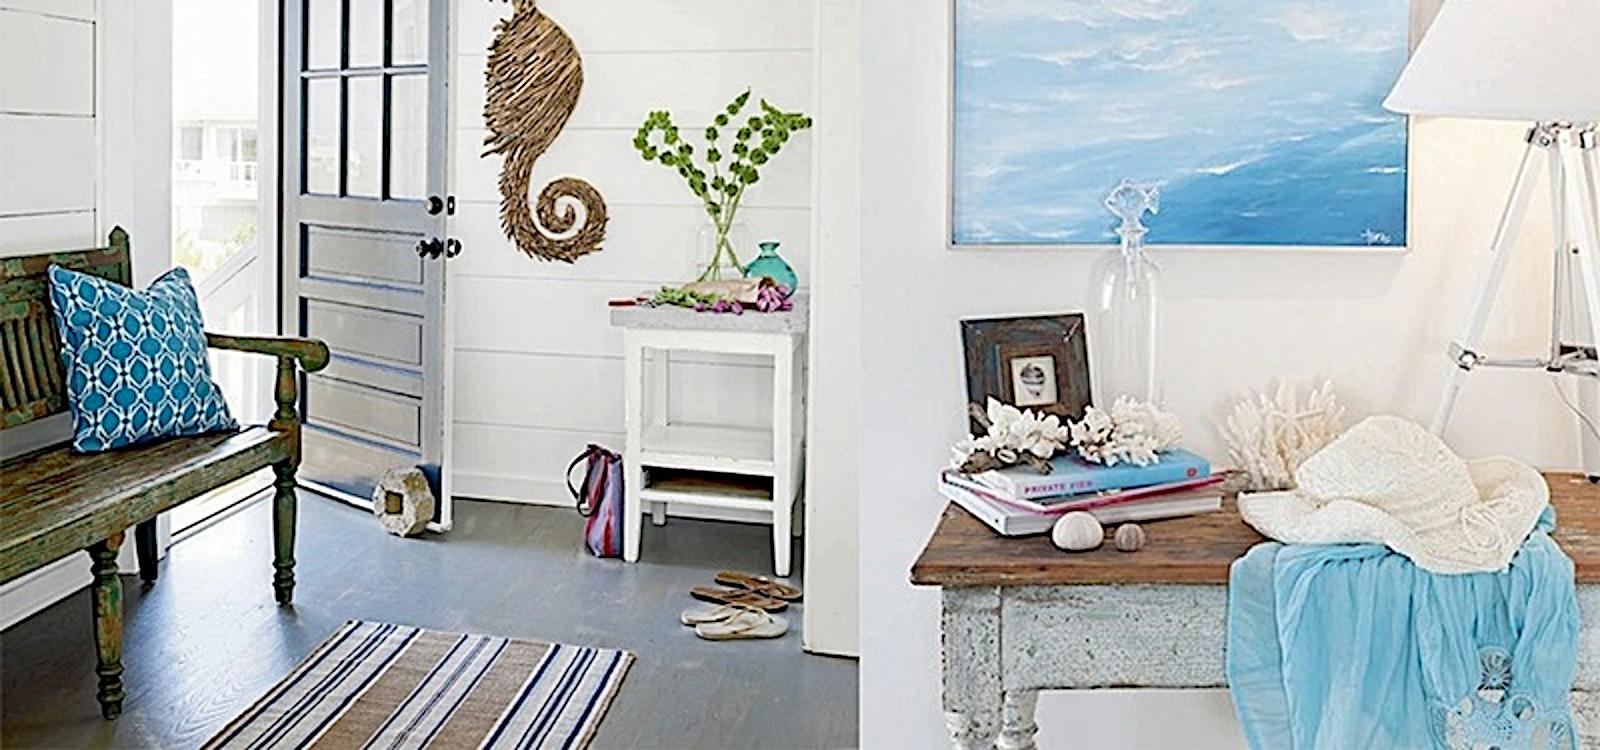 Excellent nautical coastal theme decor